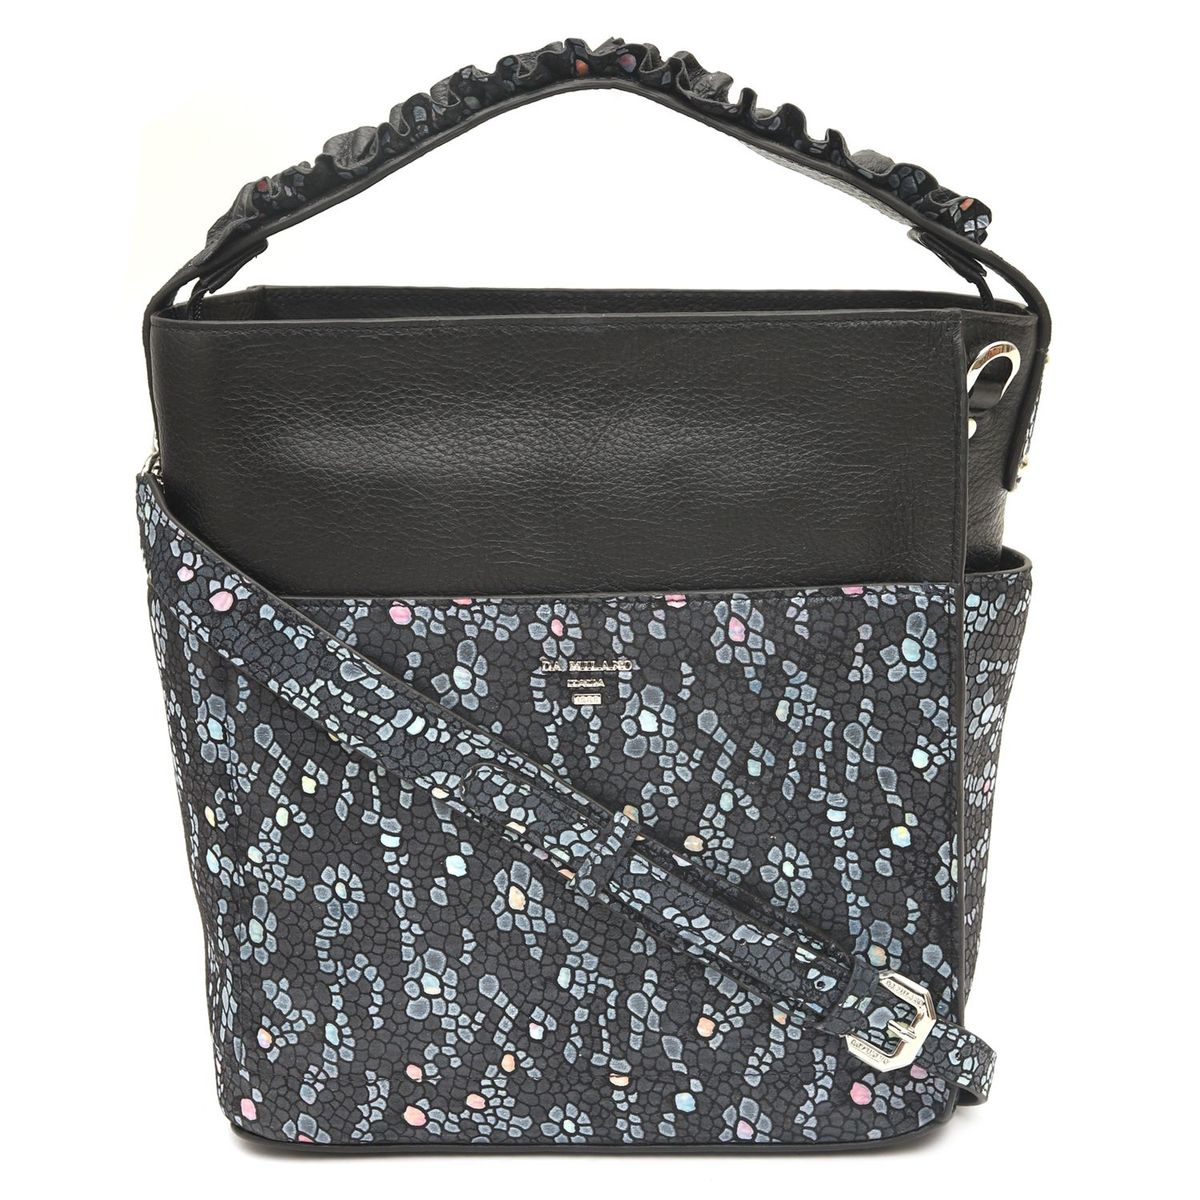 cac4bbcdd5b0 ... Da Milano Grey   Black Satchel Bag. sold-out-image zoom Da ...